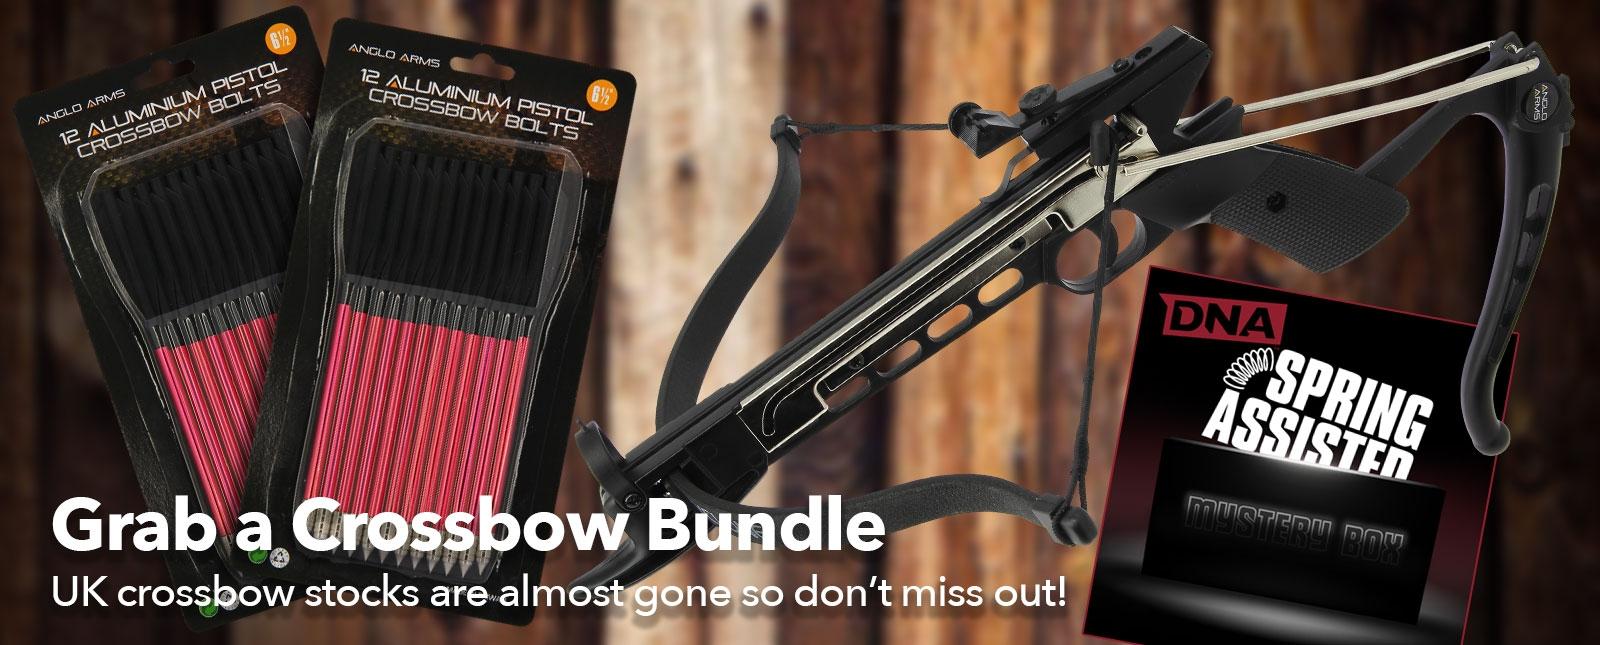 DNA Leisure Crossbow Bundle Deals